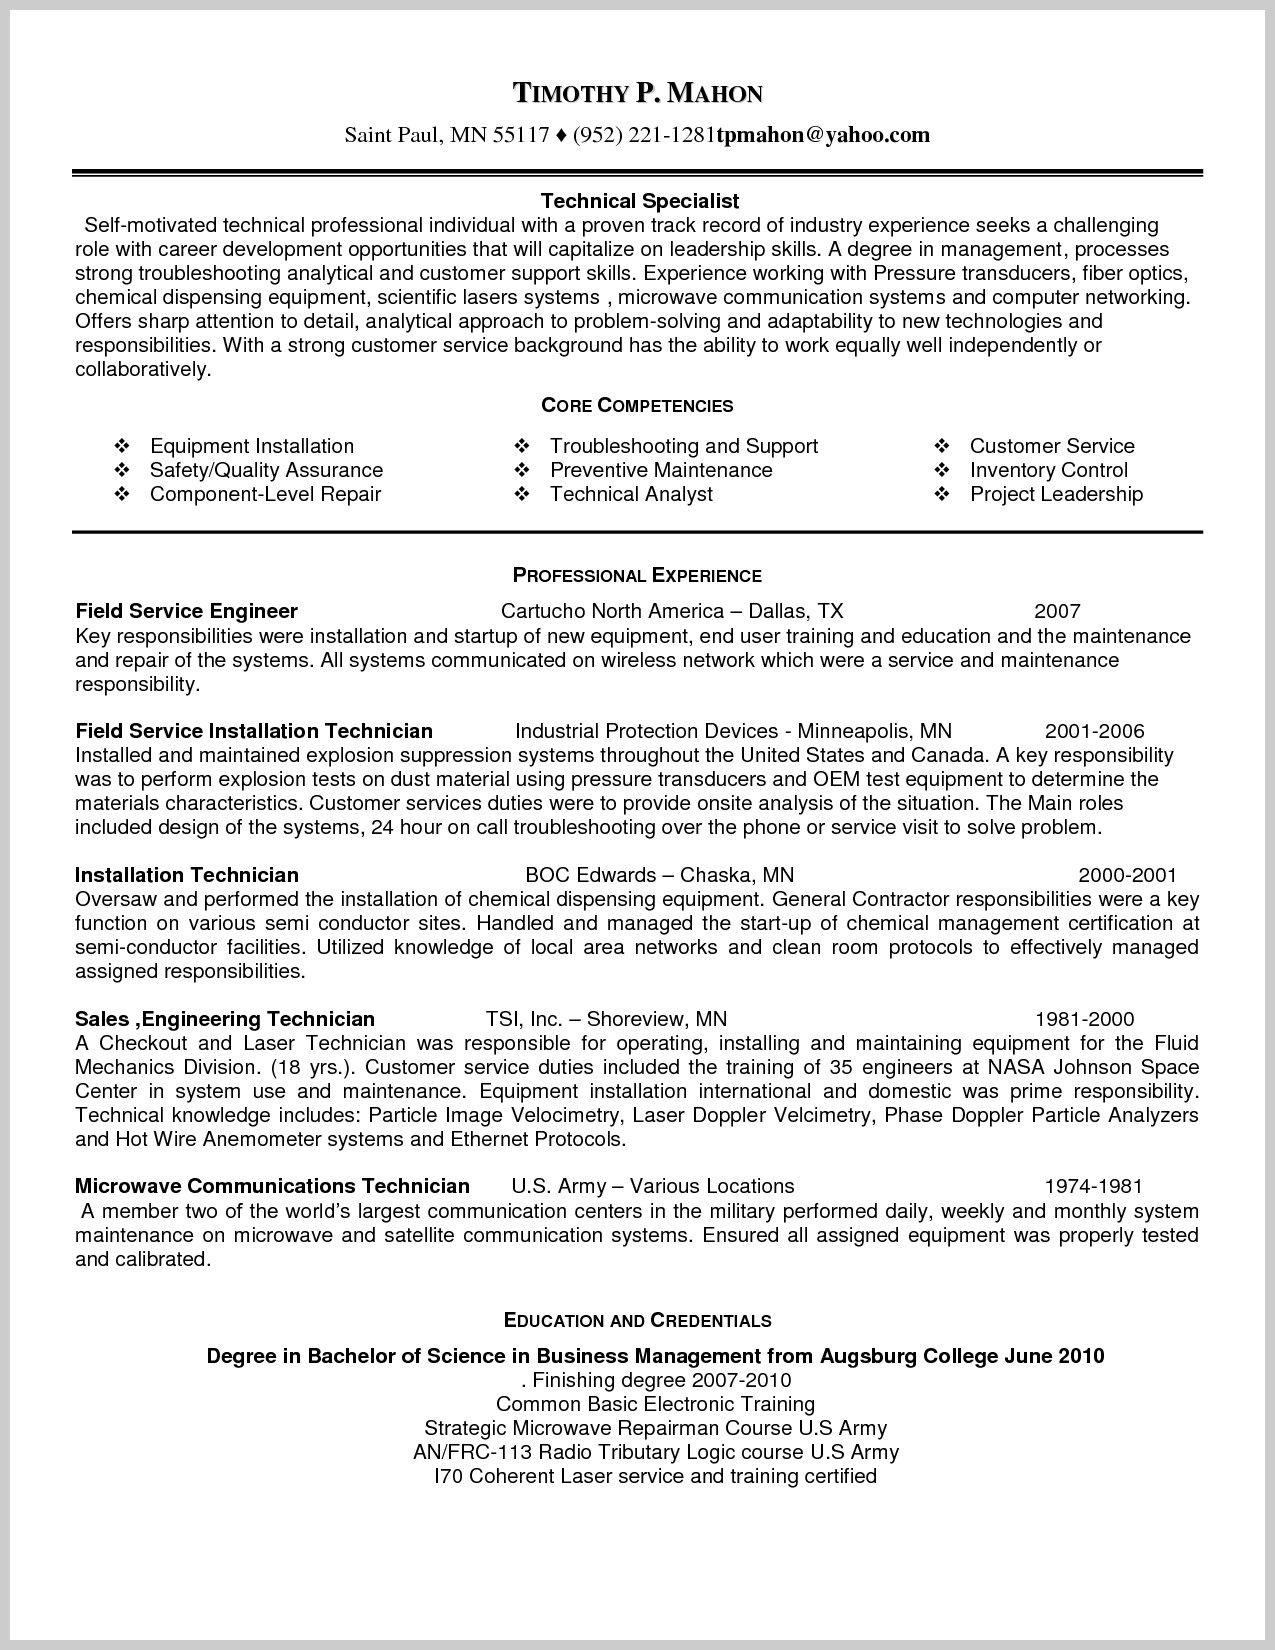 Sample Resume For Field Service Technician 218944 Brilliant Ideas Customer Service Engineer Sample Resume Resume Examples Resume Skills Cover Letter For Resume